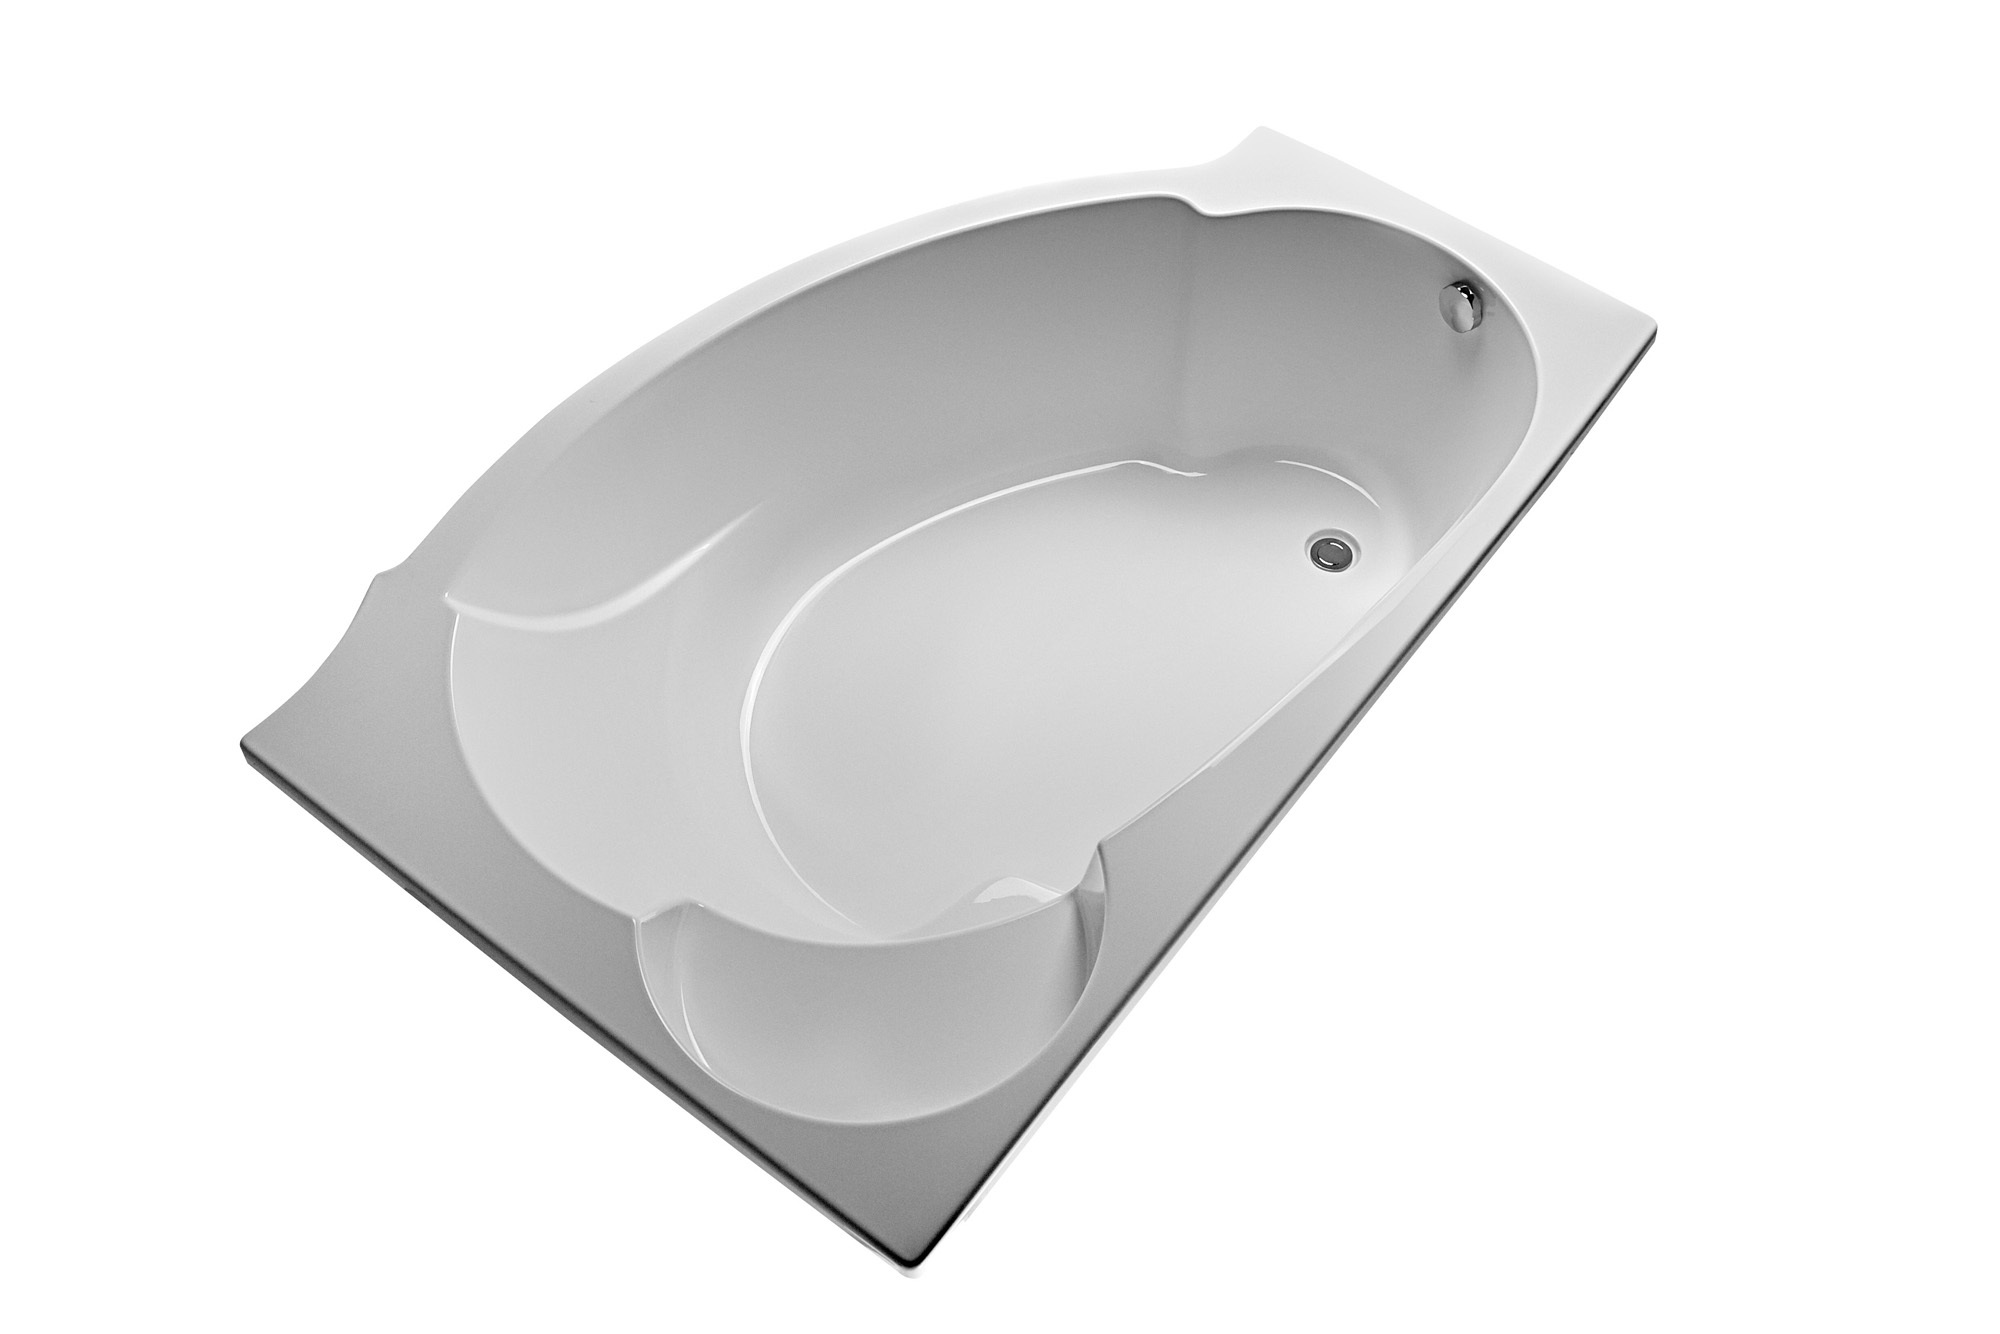 Ванна акриловая 170х110 Александрия правая, Eurolux